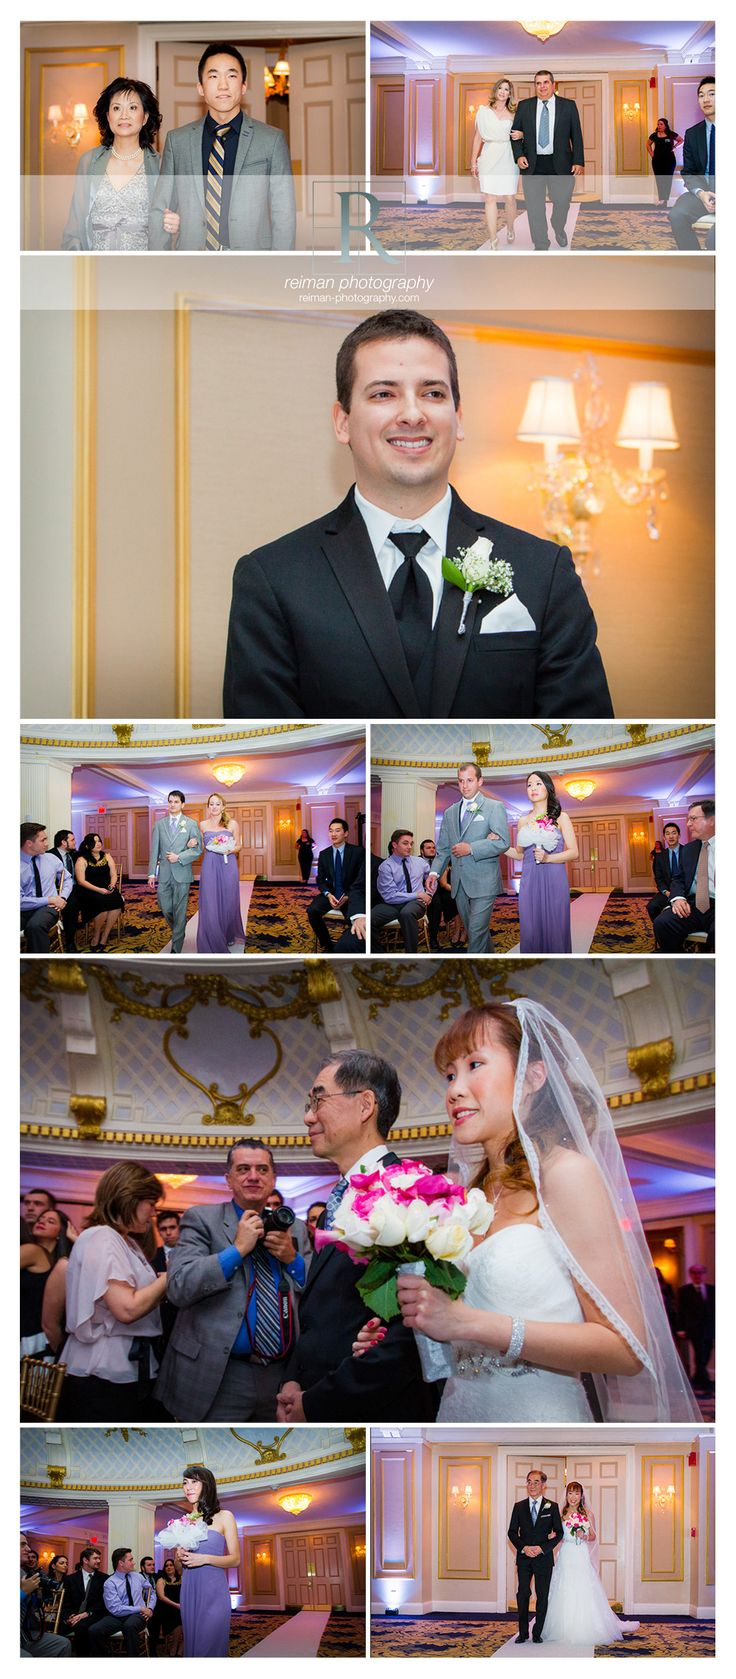 Elegant Wedding at the Lenox Hotel